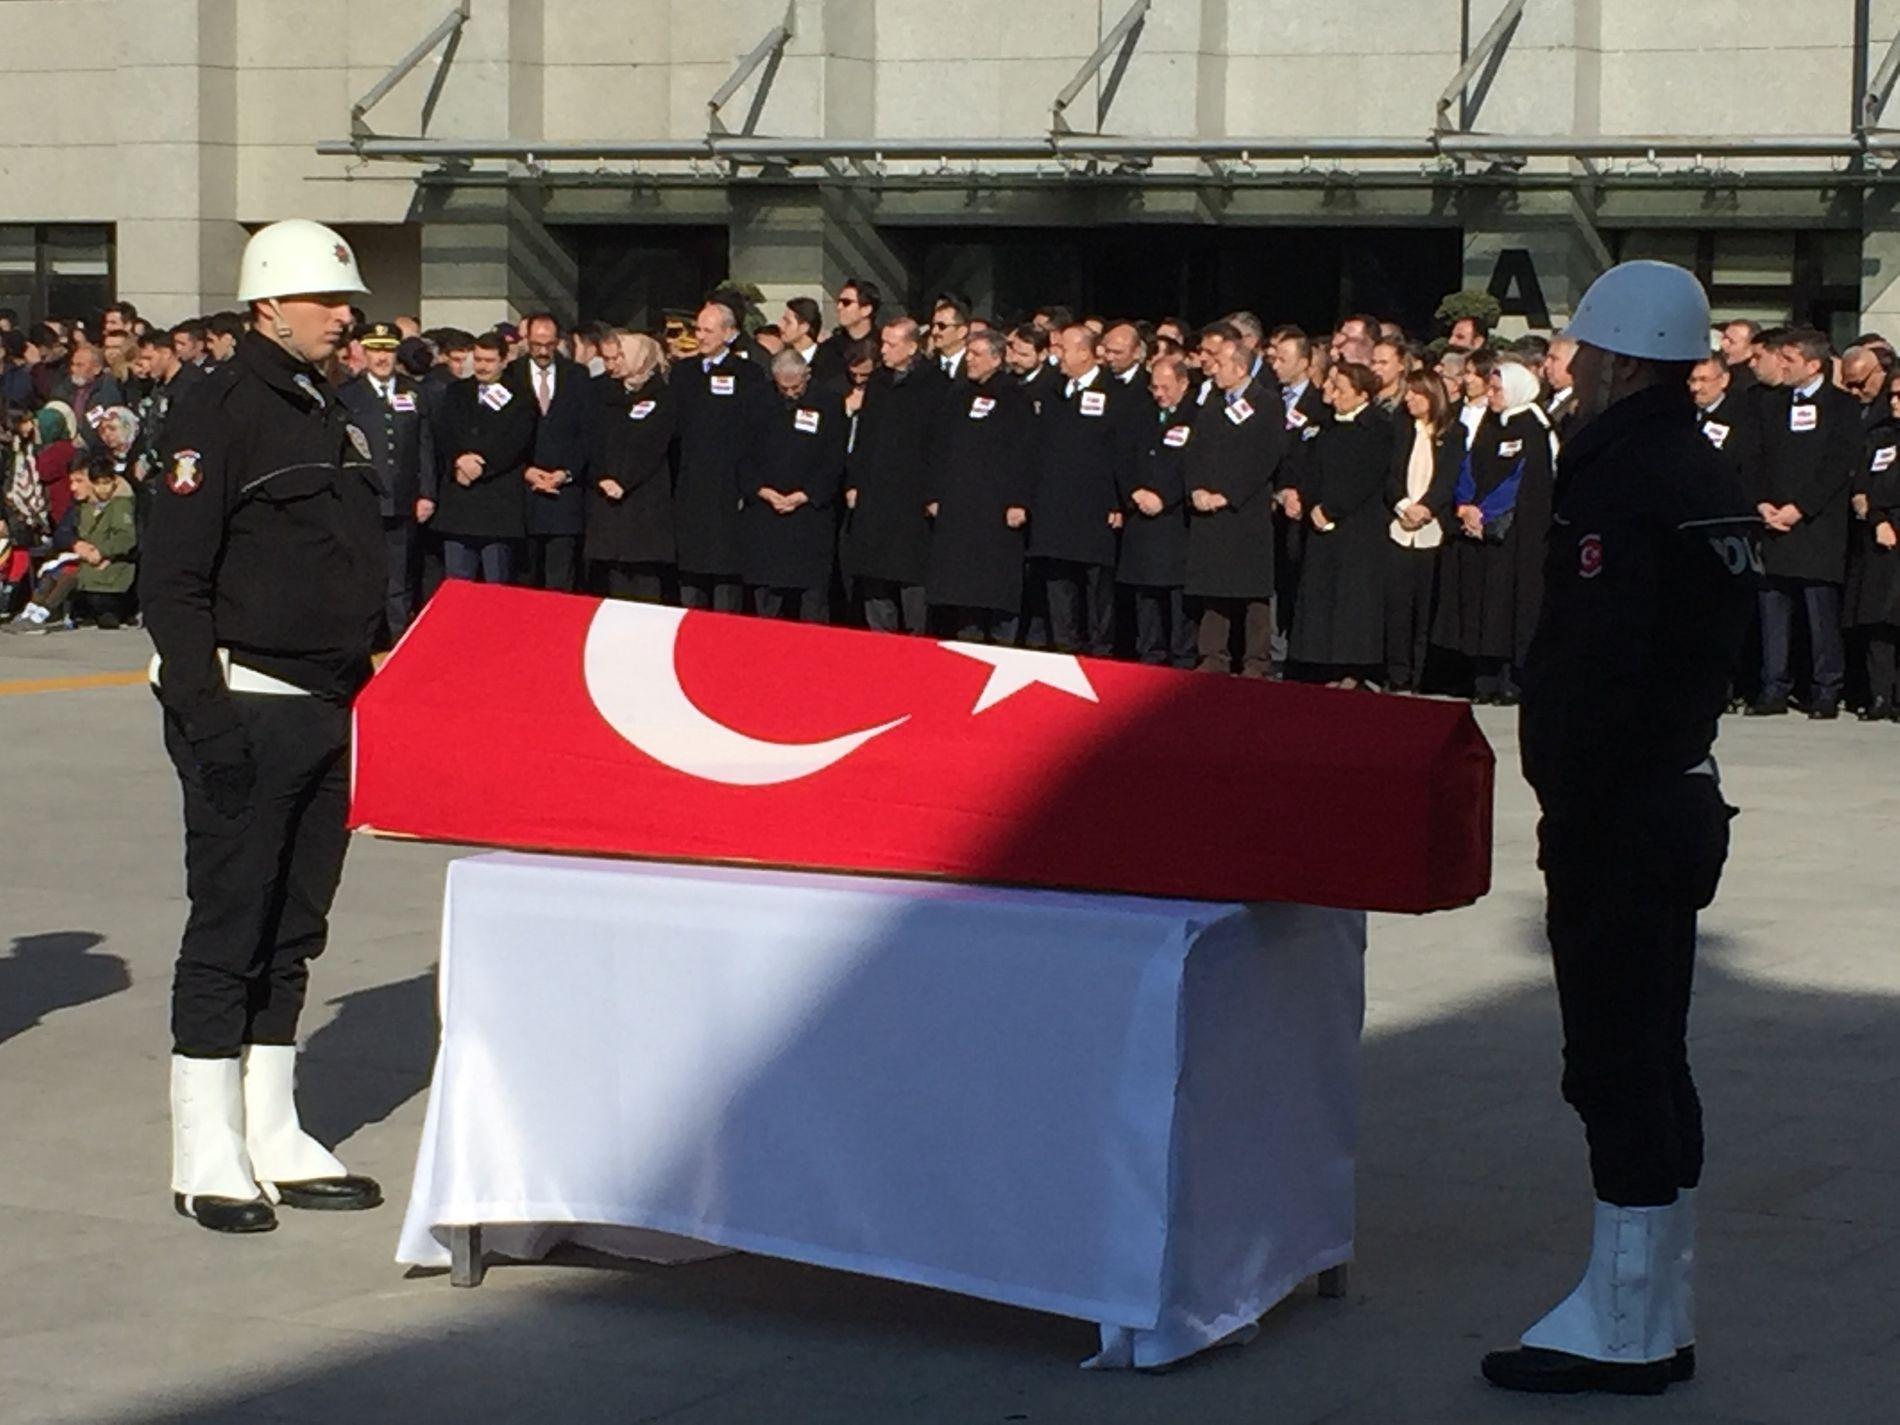 MINNESTUND: Det holdes minnestund for drepte politimenn i Istanbul. I midten bak: President Recep Tayyip Erdogan og statsminister Binali Yildirim.